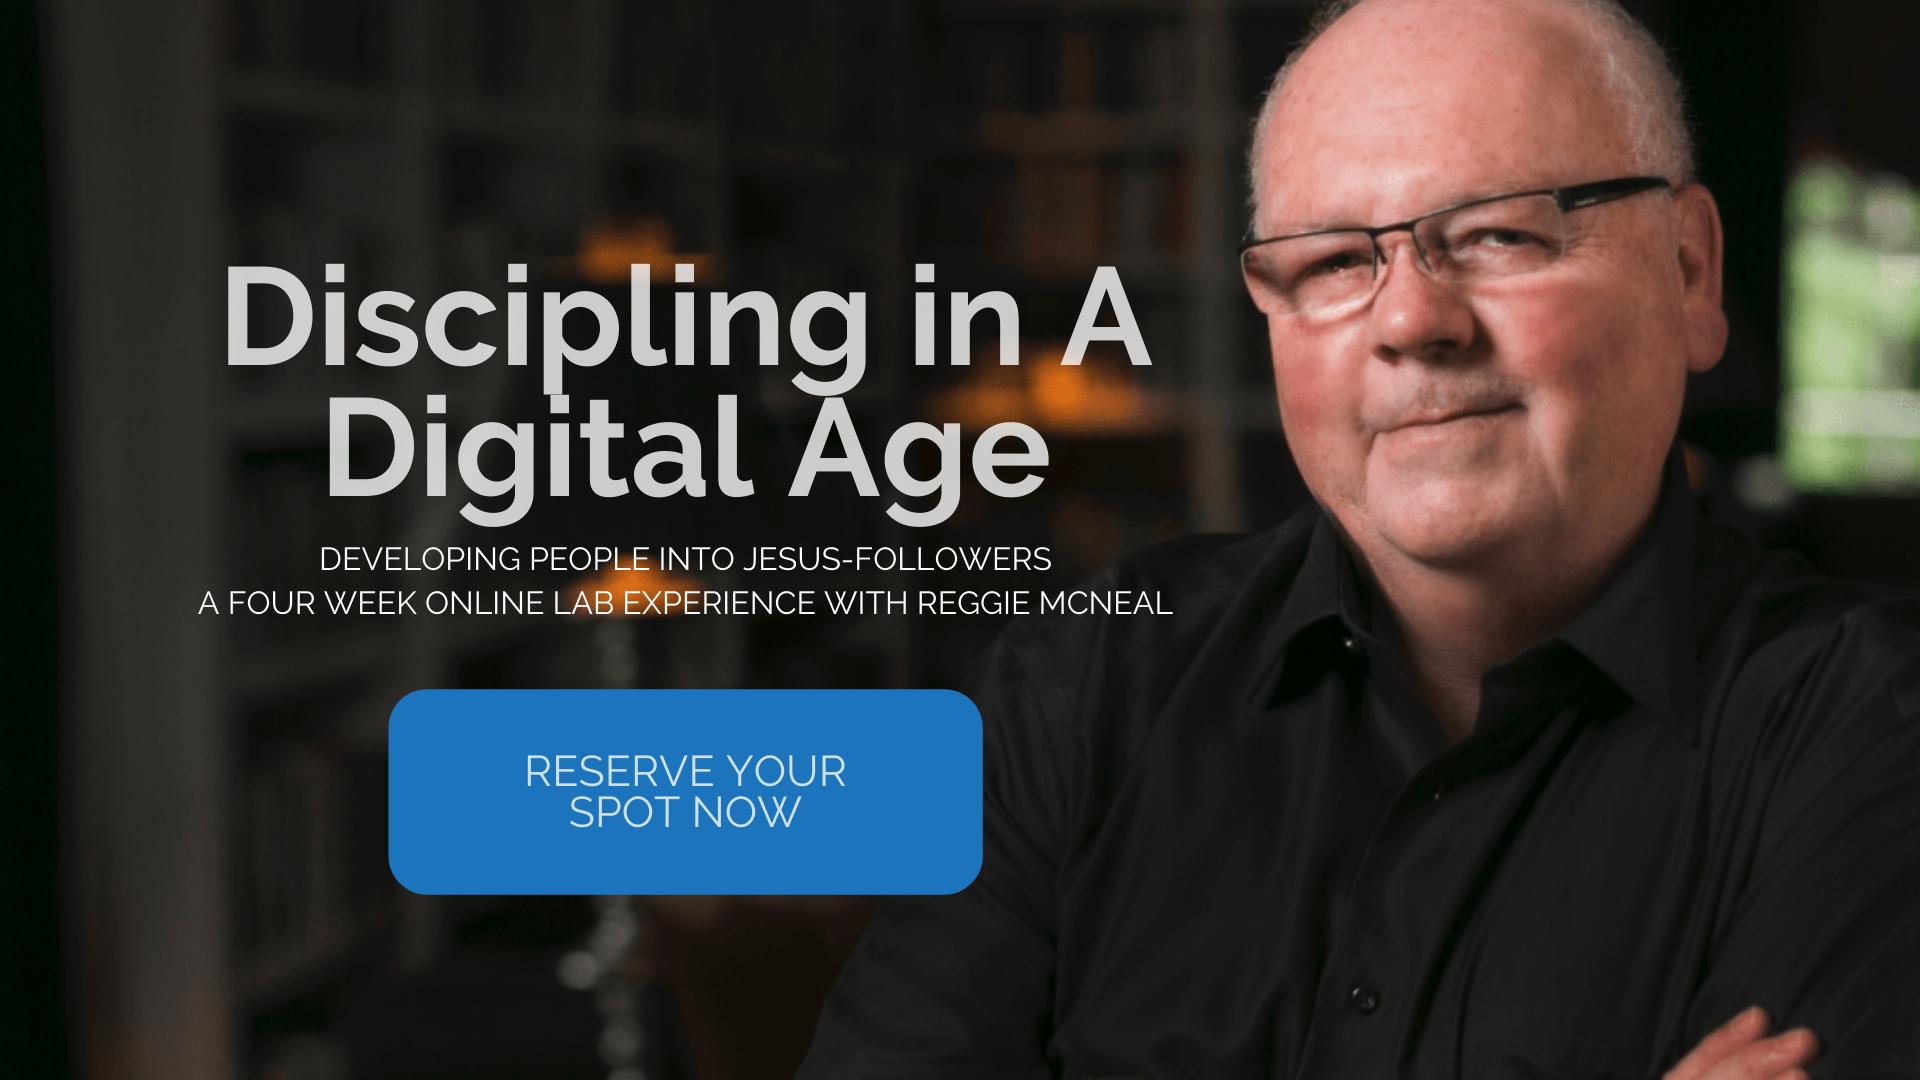 Discipling Digital Age Lab